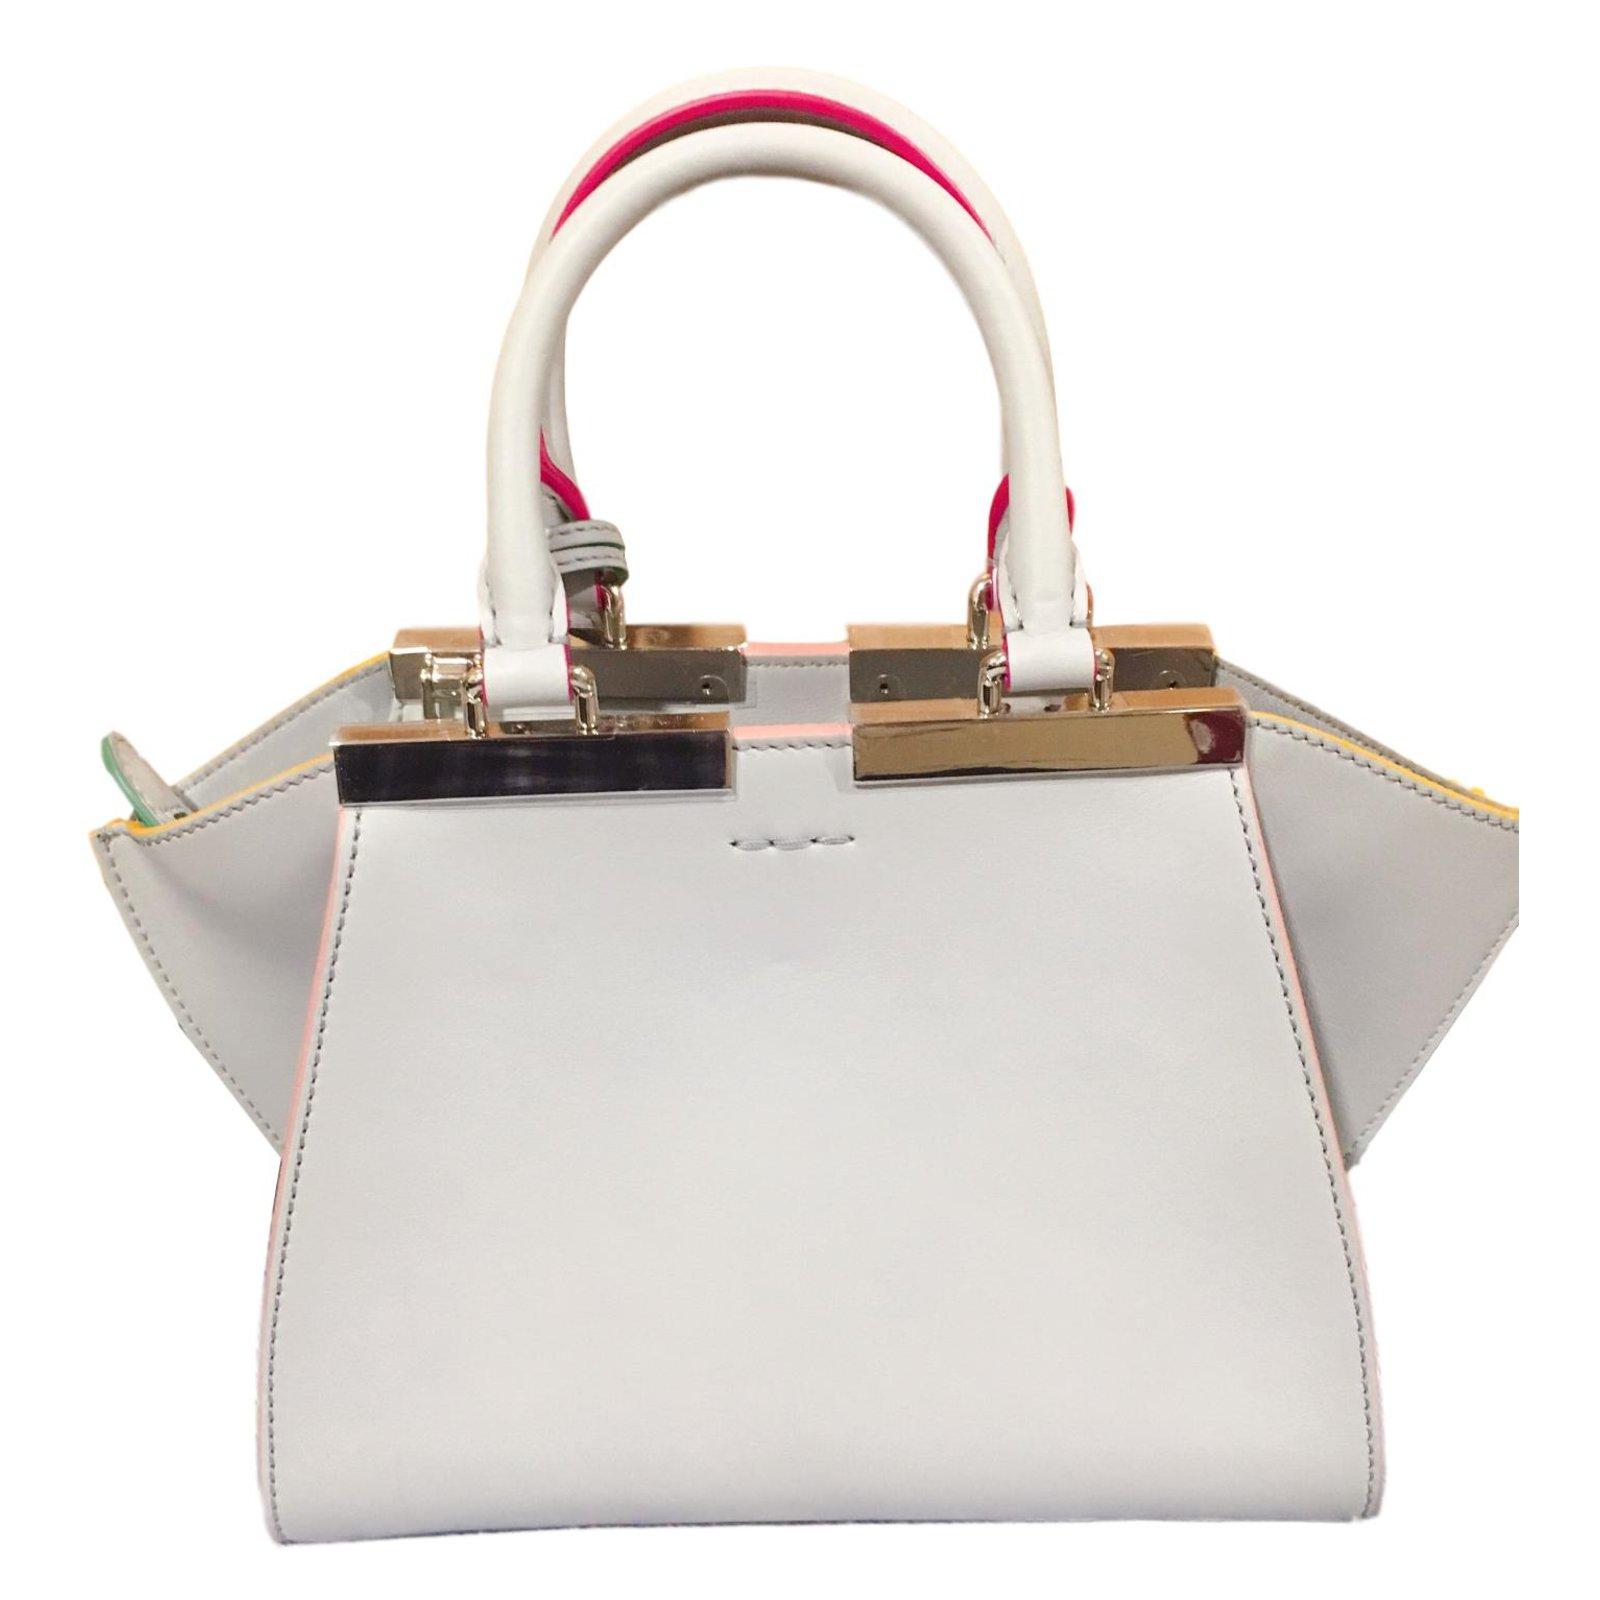 445108cad8a Fendi Handbags Handbags Leather Beige ref.71339 - Joli Closet